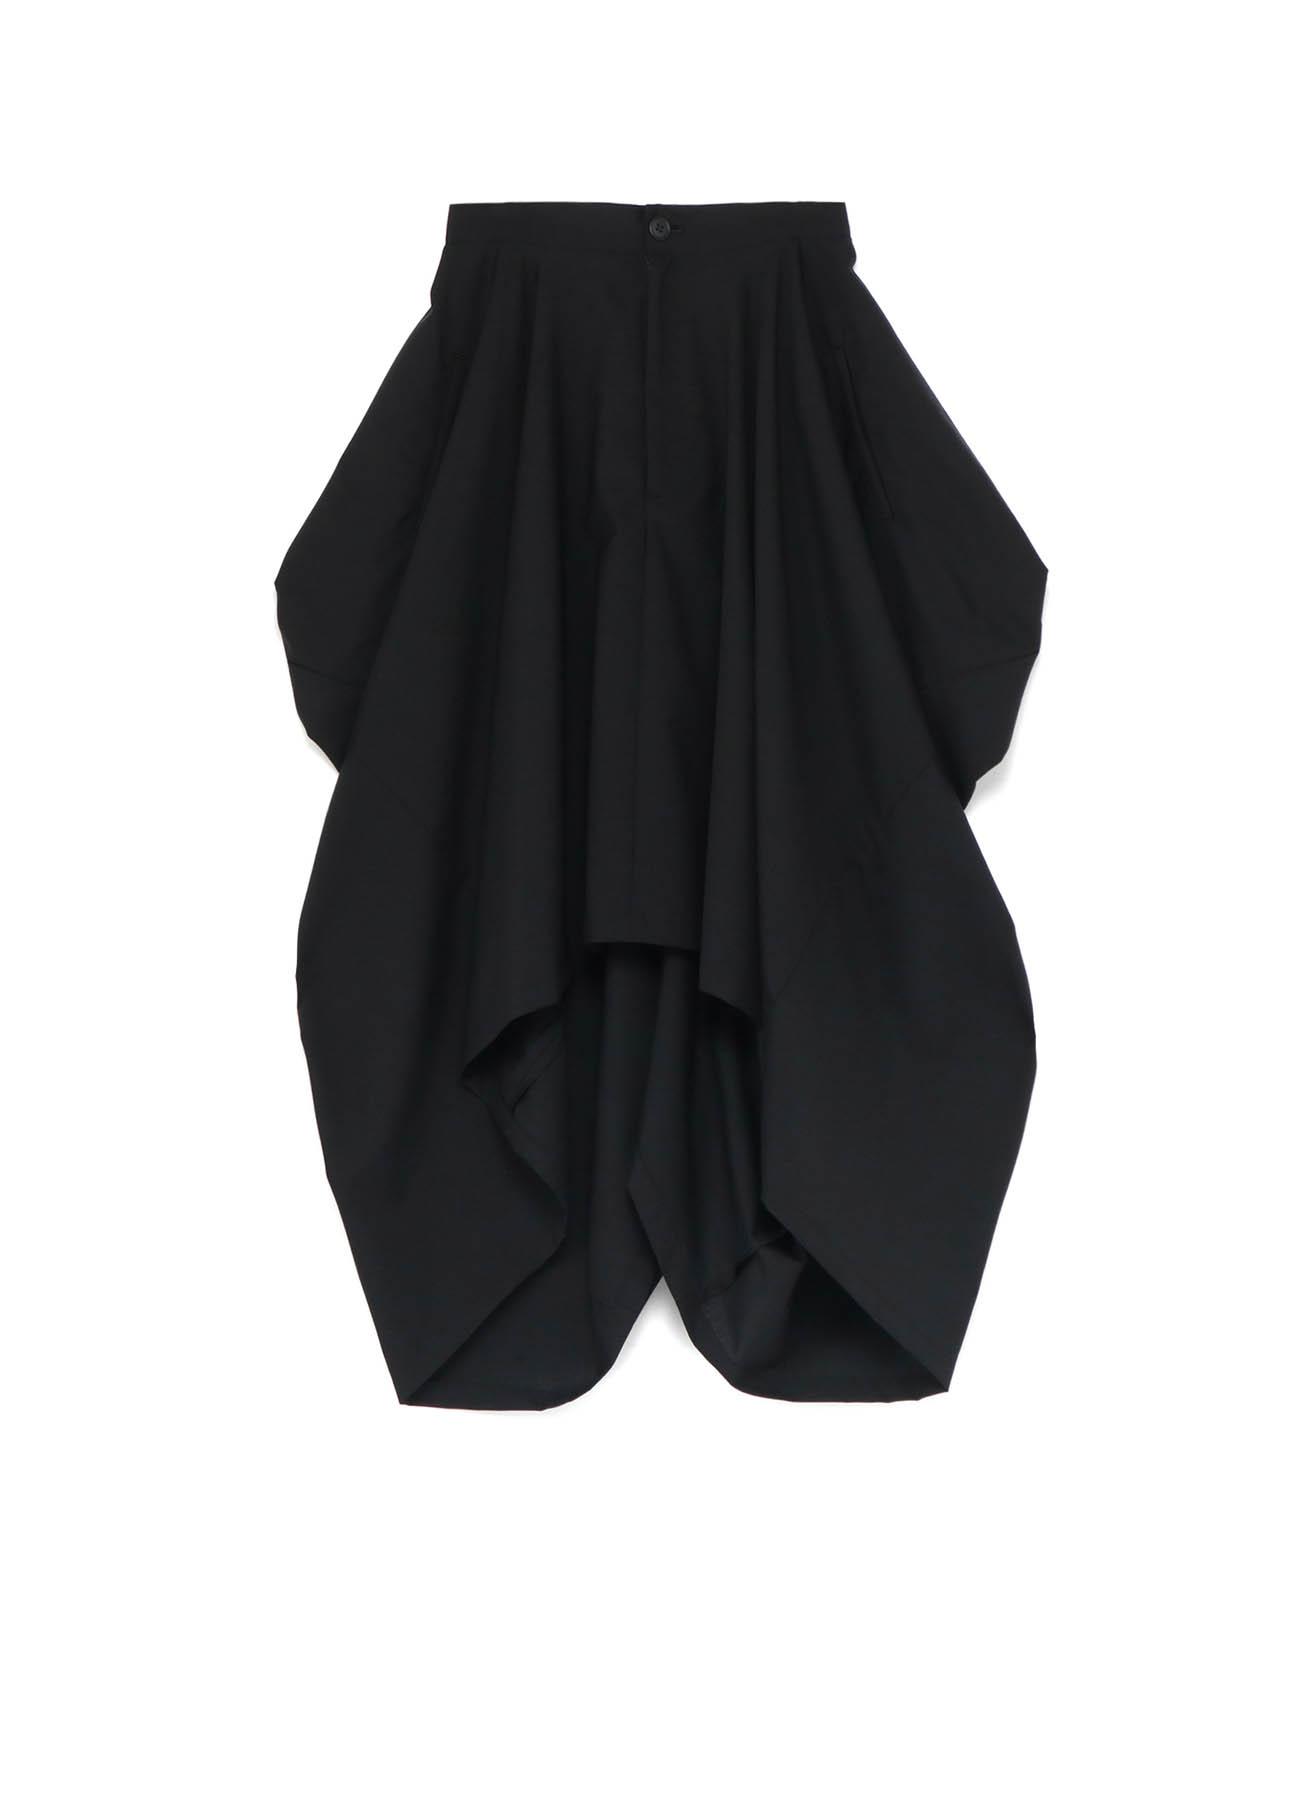 W/Moh Tropical Square Back Long Skirt